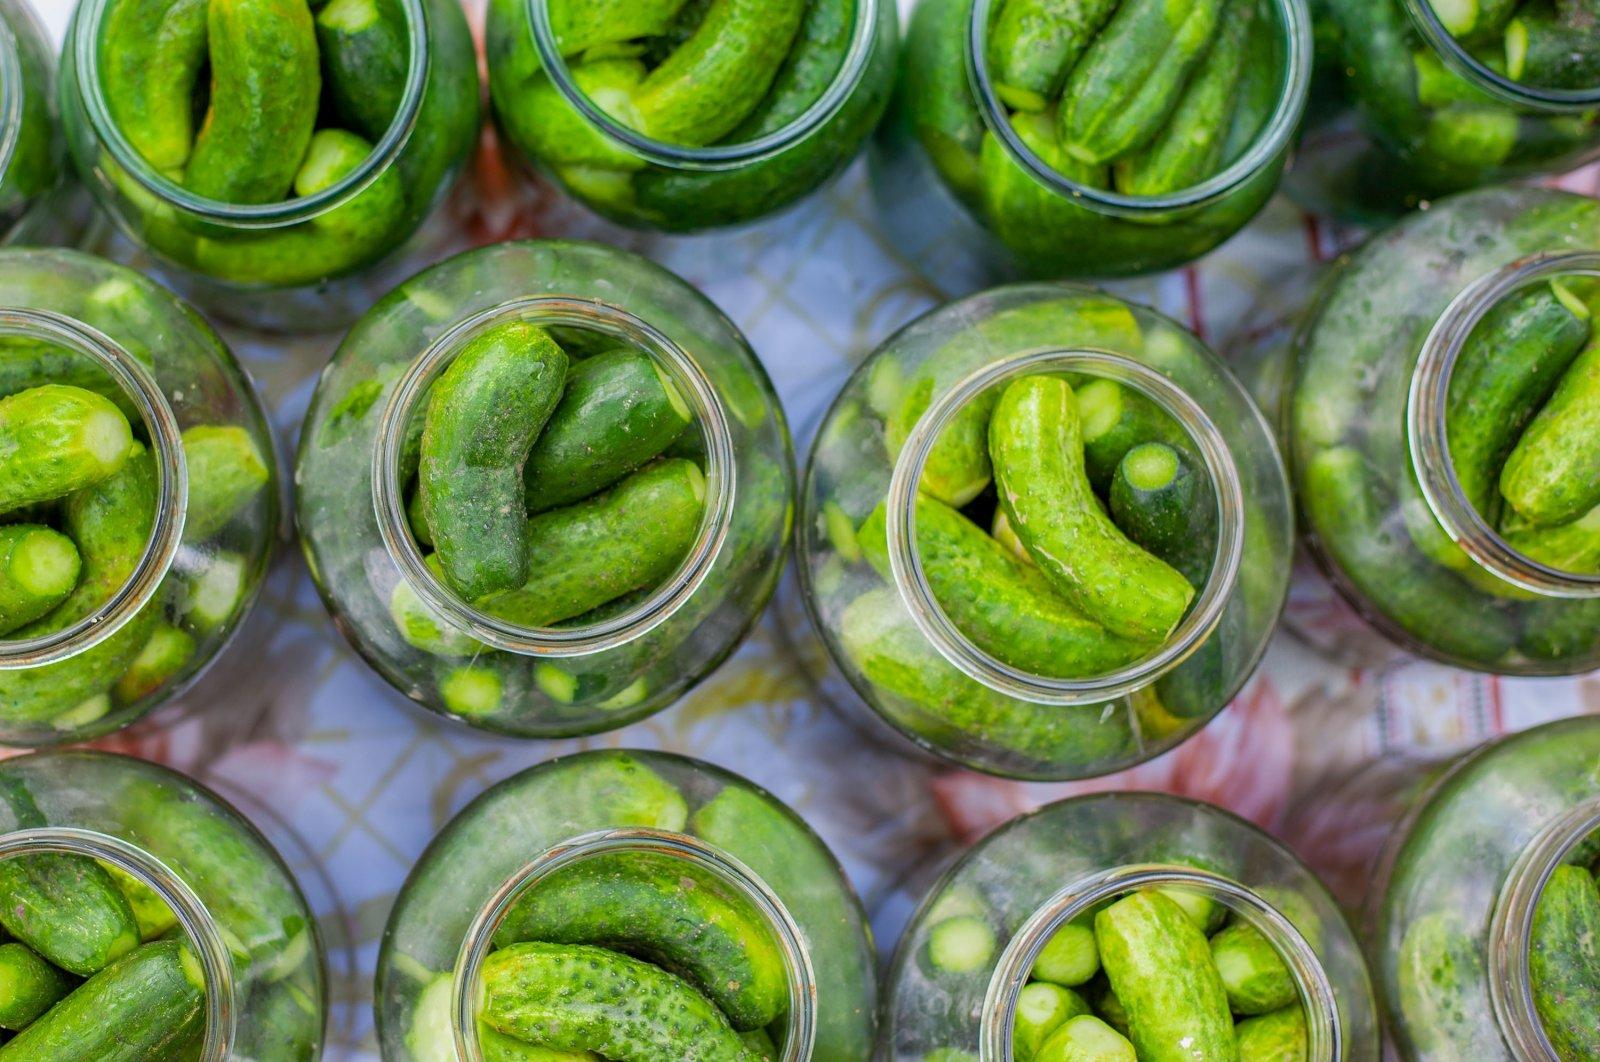 Pickled cucumbers, or gherkins, rest in jars.(Shutterstock Photo)